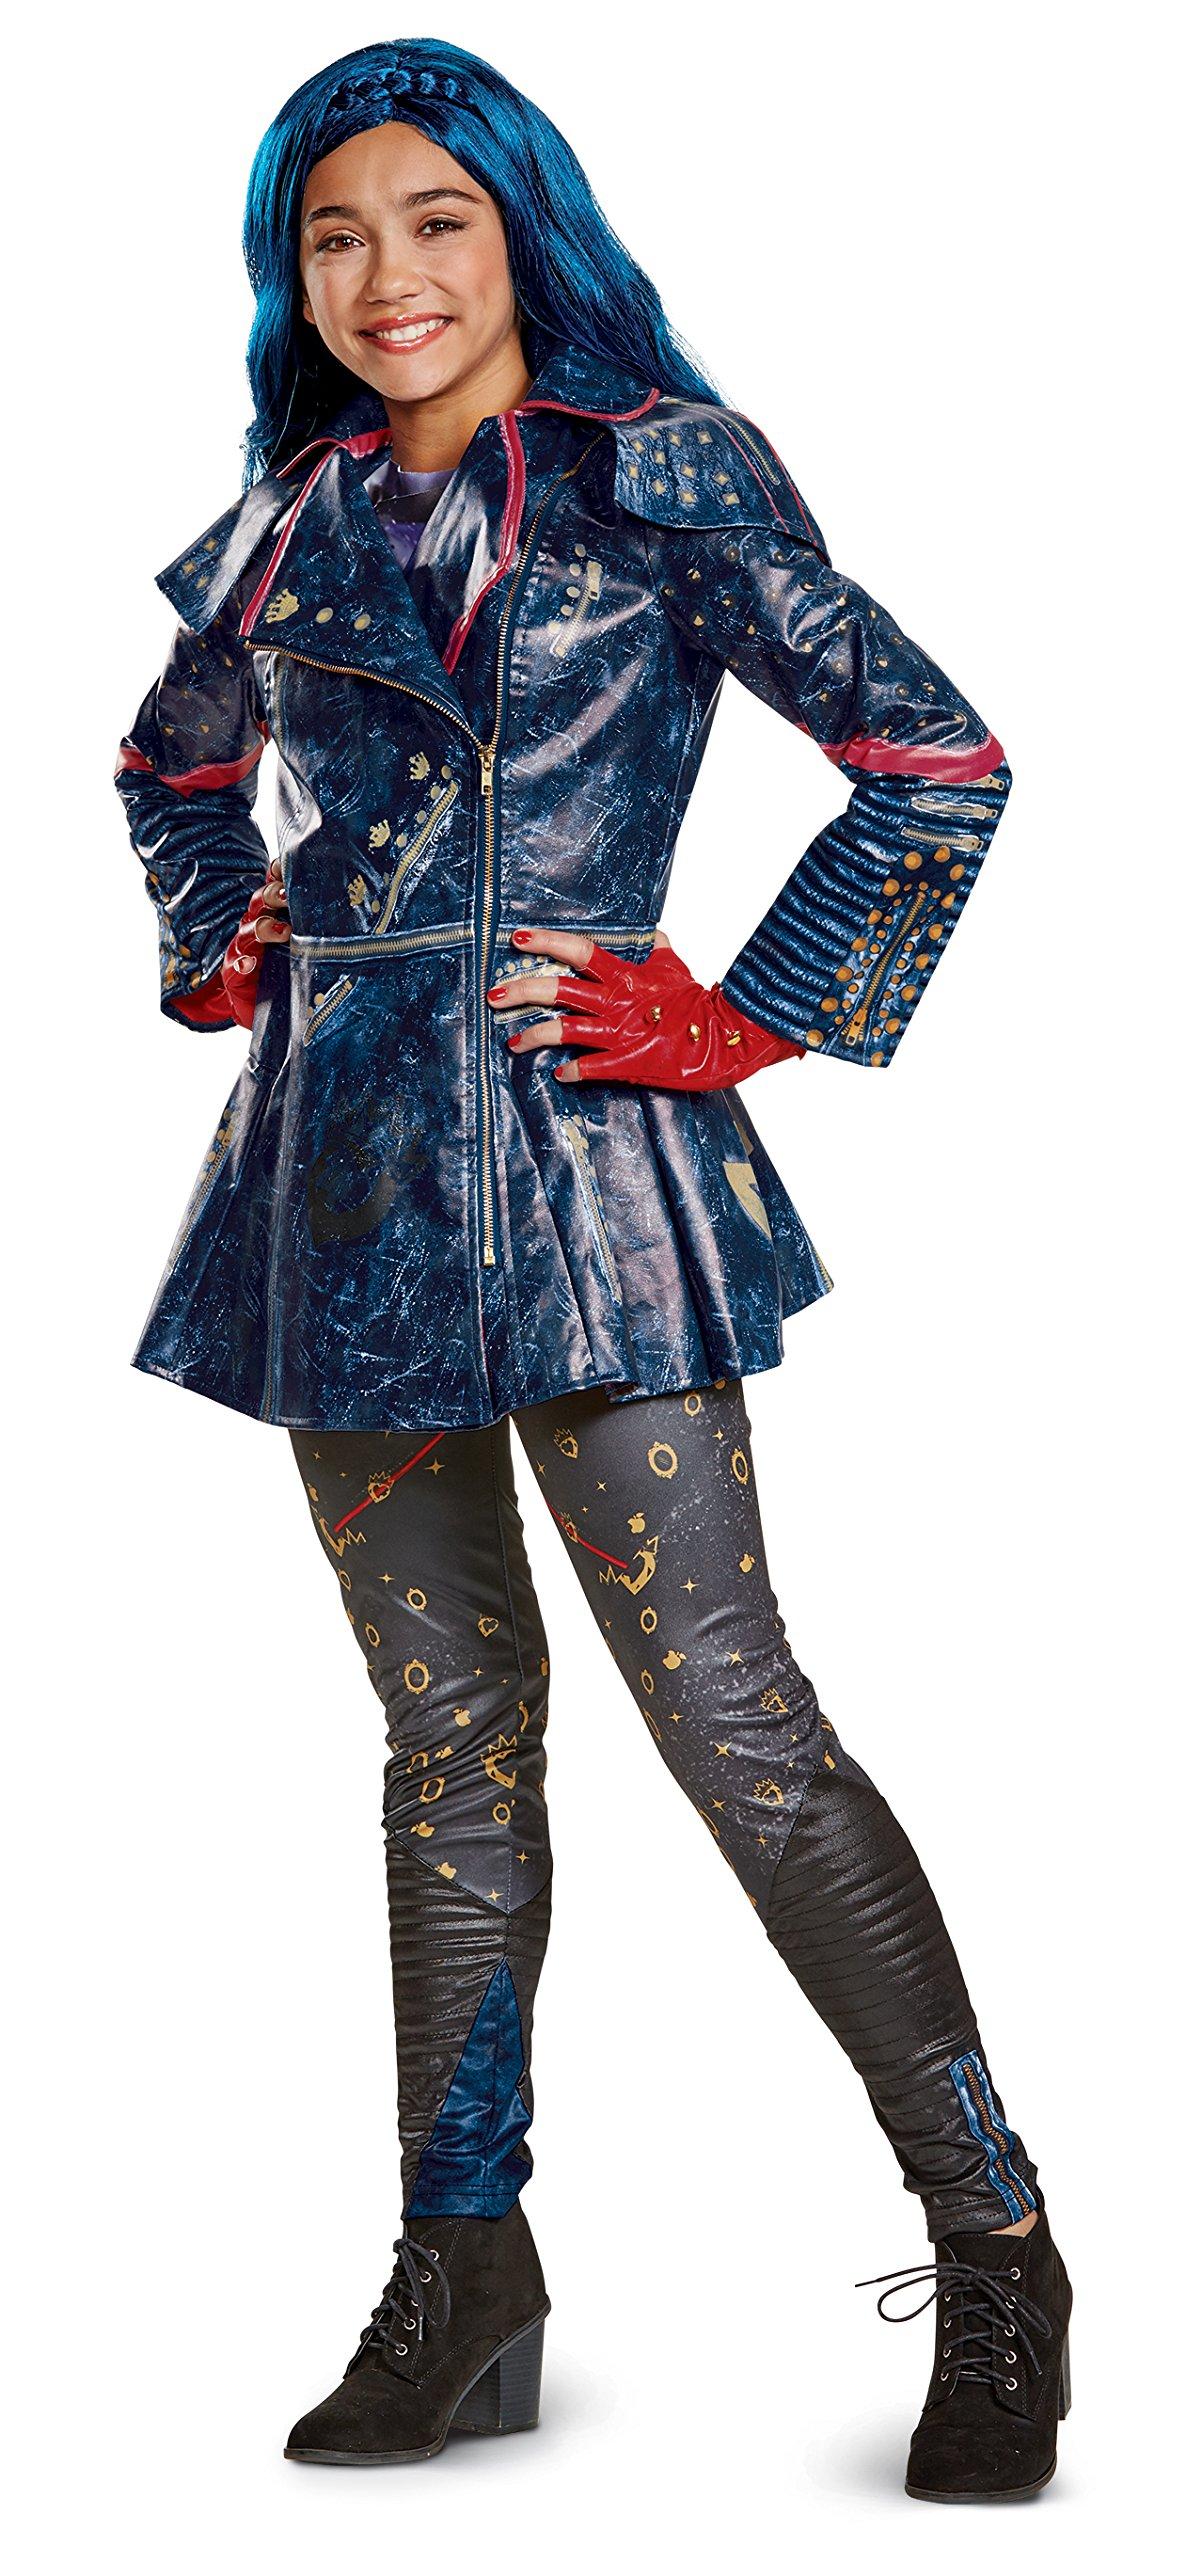 Disney Evie Prestige Descendants 2 Costume, Blue, Medium (7-8)